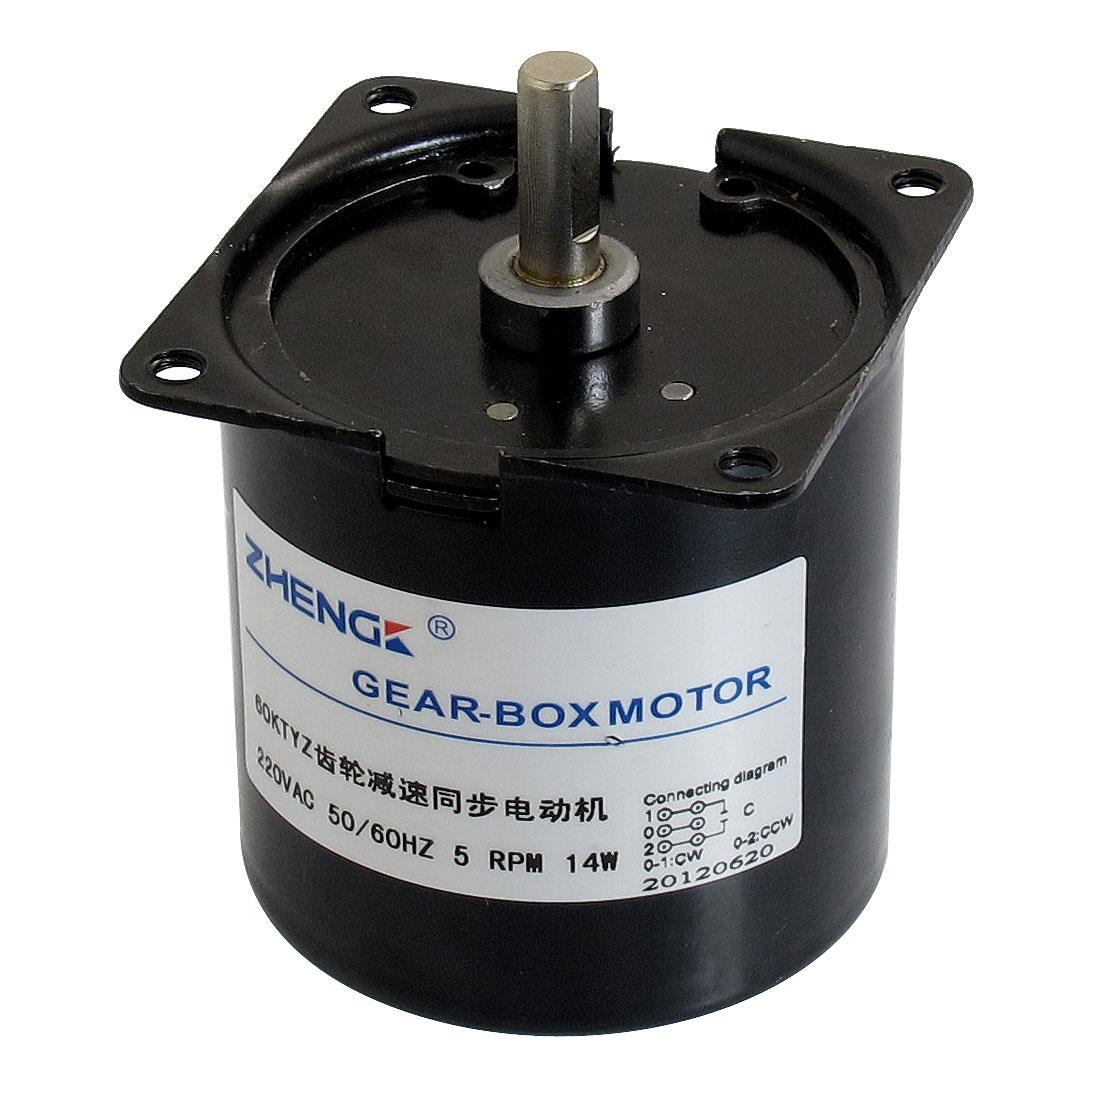 AC 220V 5RPM 14W Cylinder Shape Geared Motor 60PTYZ w Capacitor